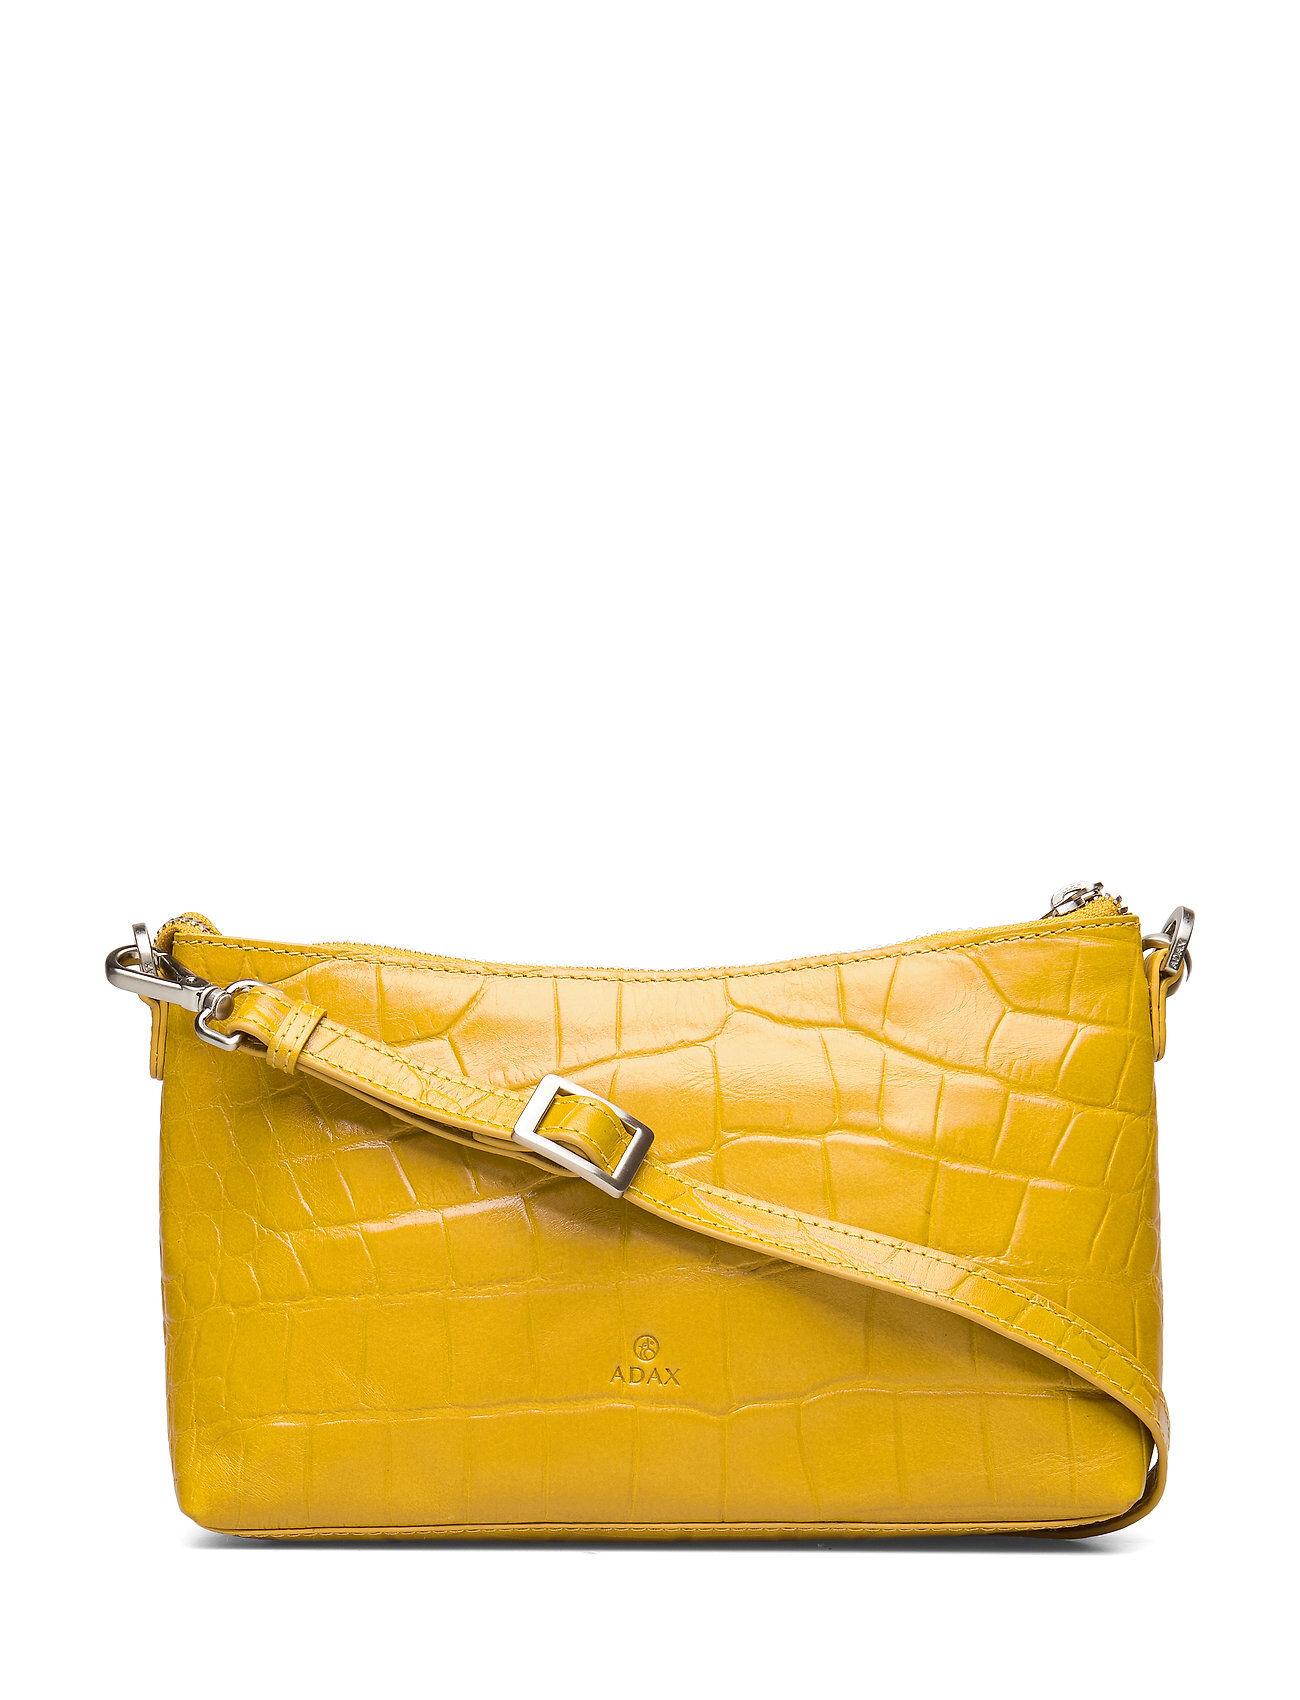 Adax Teramo Shoulder Bag Smilla Bags Small Shoulder Bags - Crossbody Bags Keltainen Adax